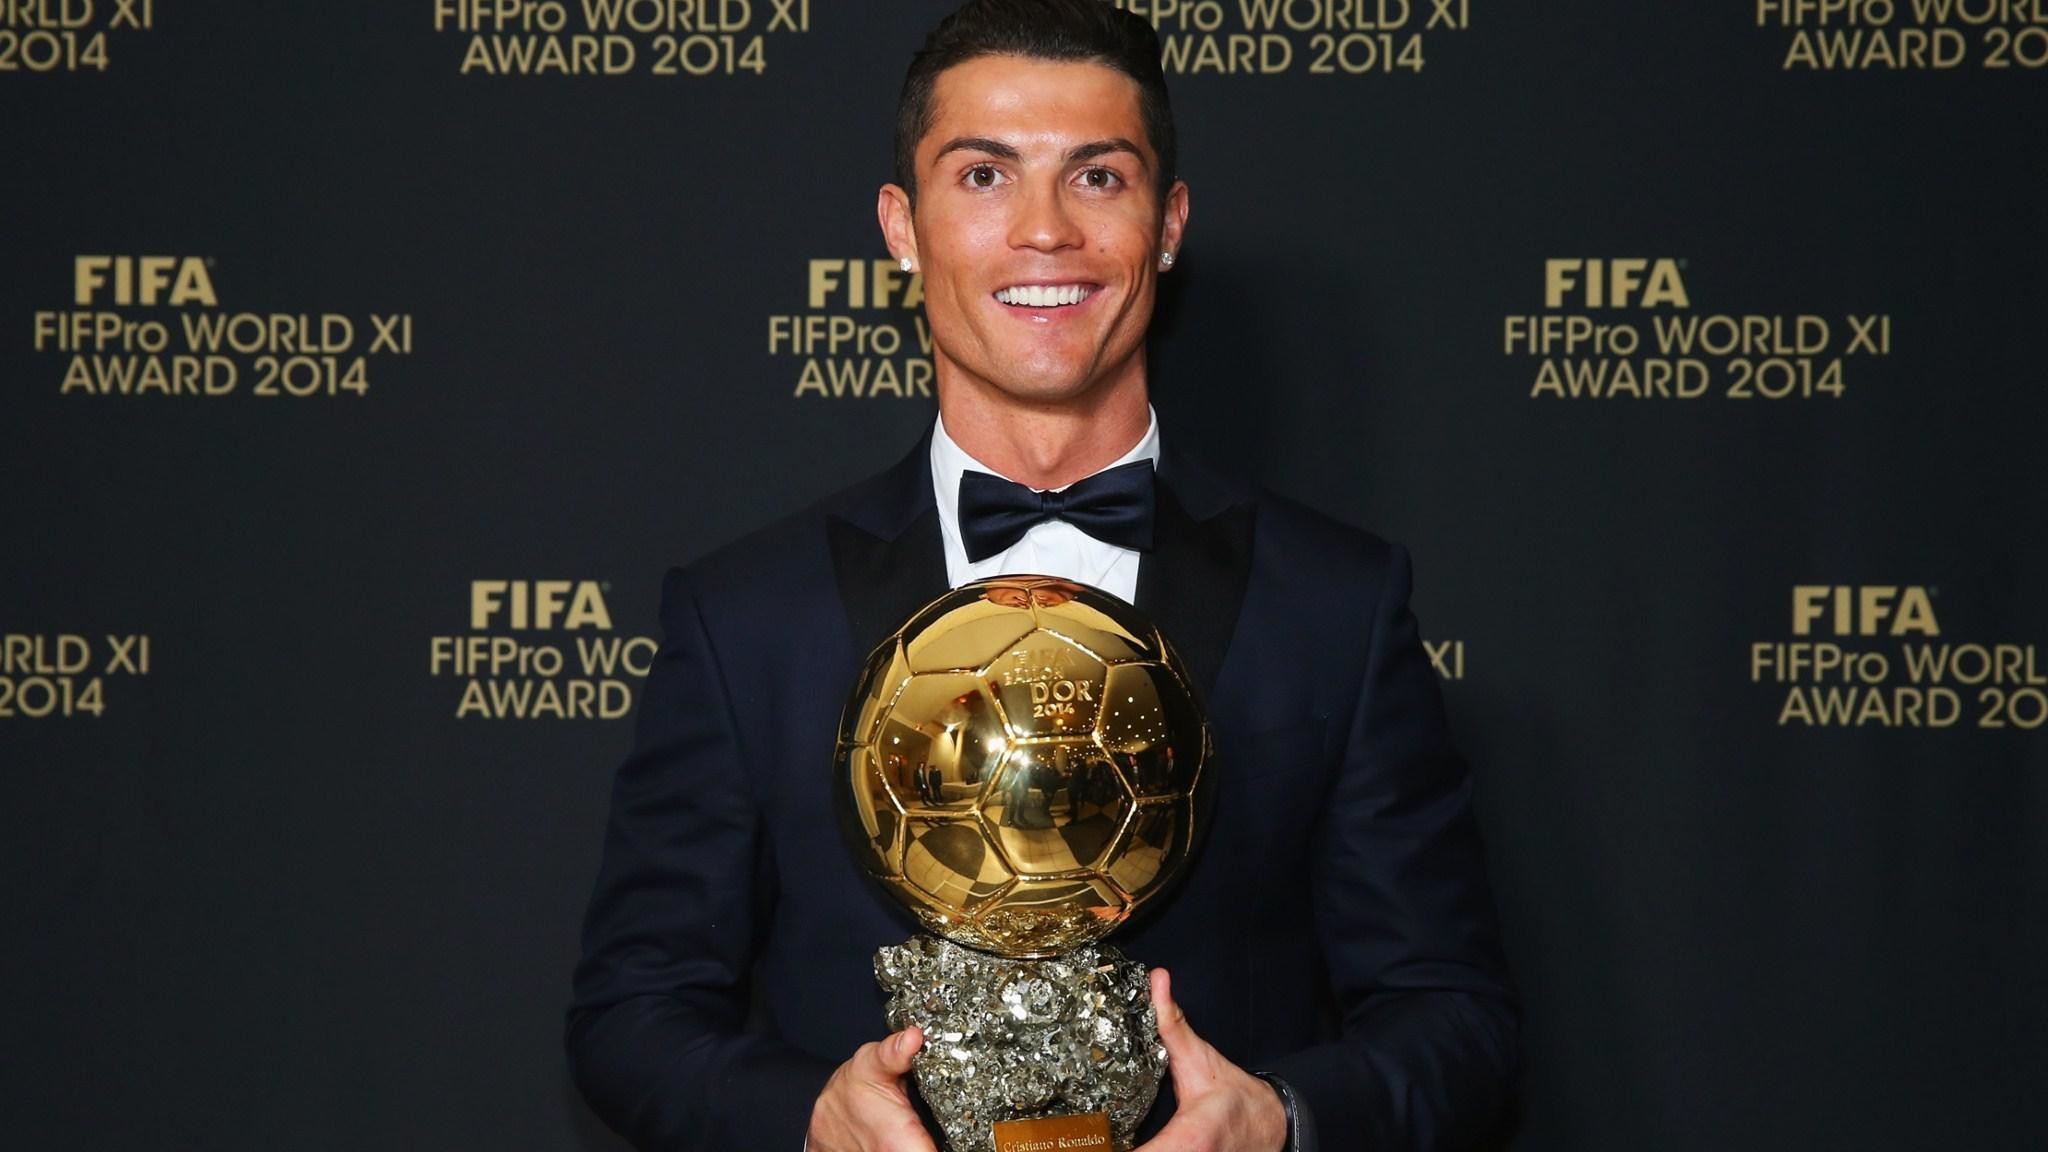 Cristiano Ronaldo Real Madrid HD desktop wallpaper 1958×1102 Images Of Cristiano  Ronaldo Wallpapers (